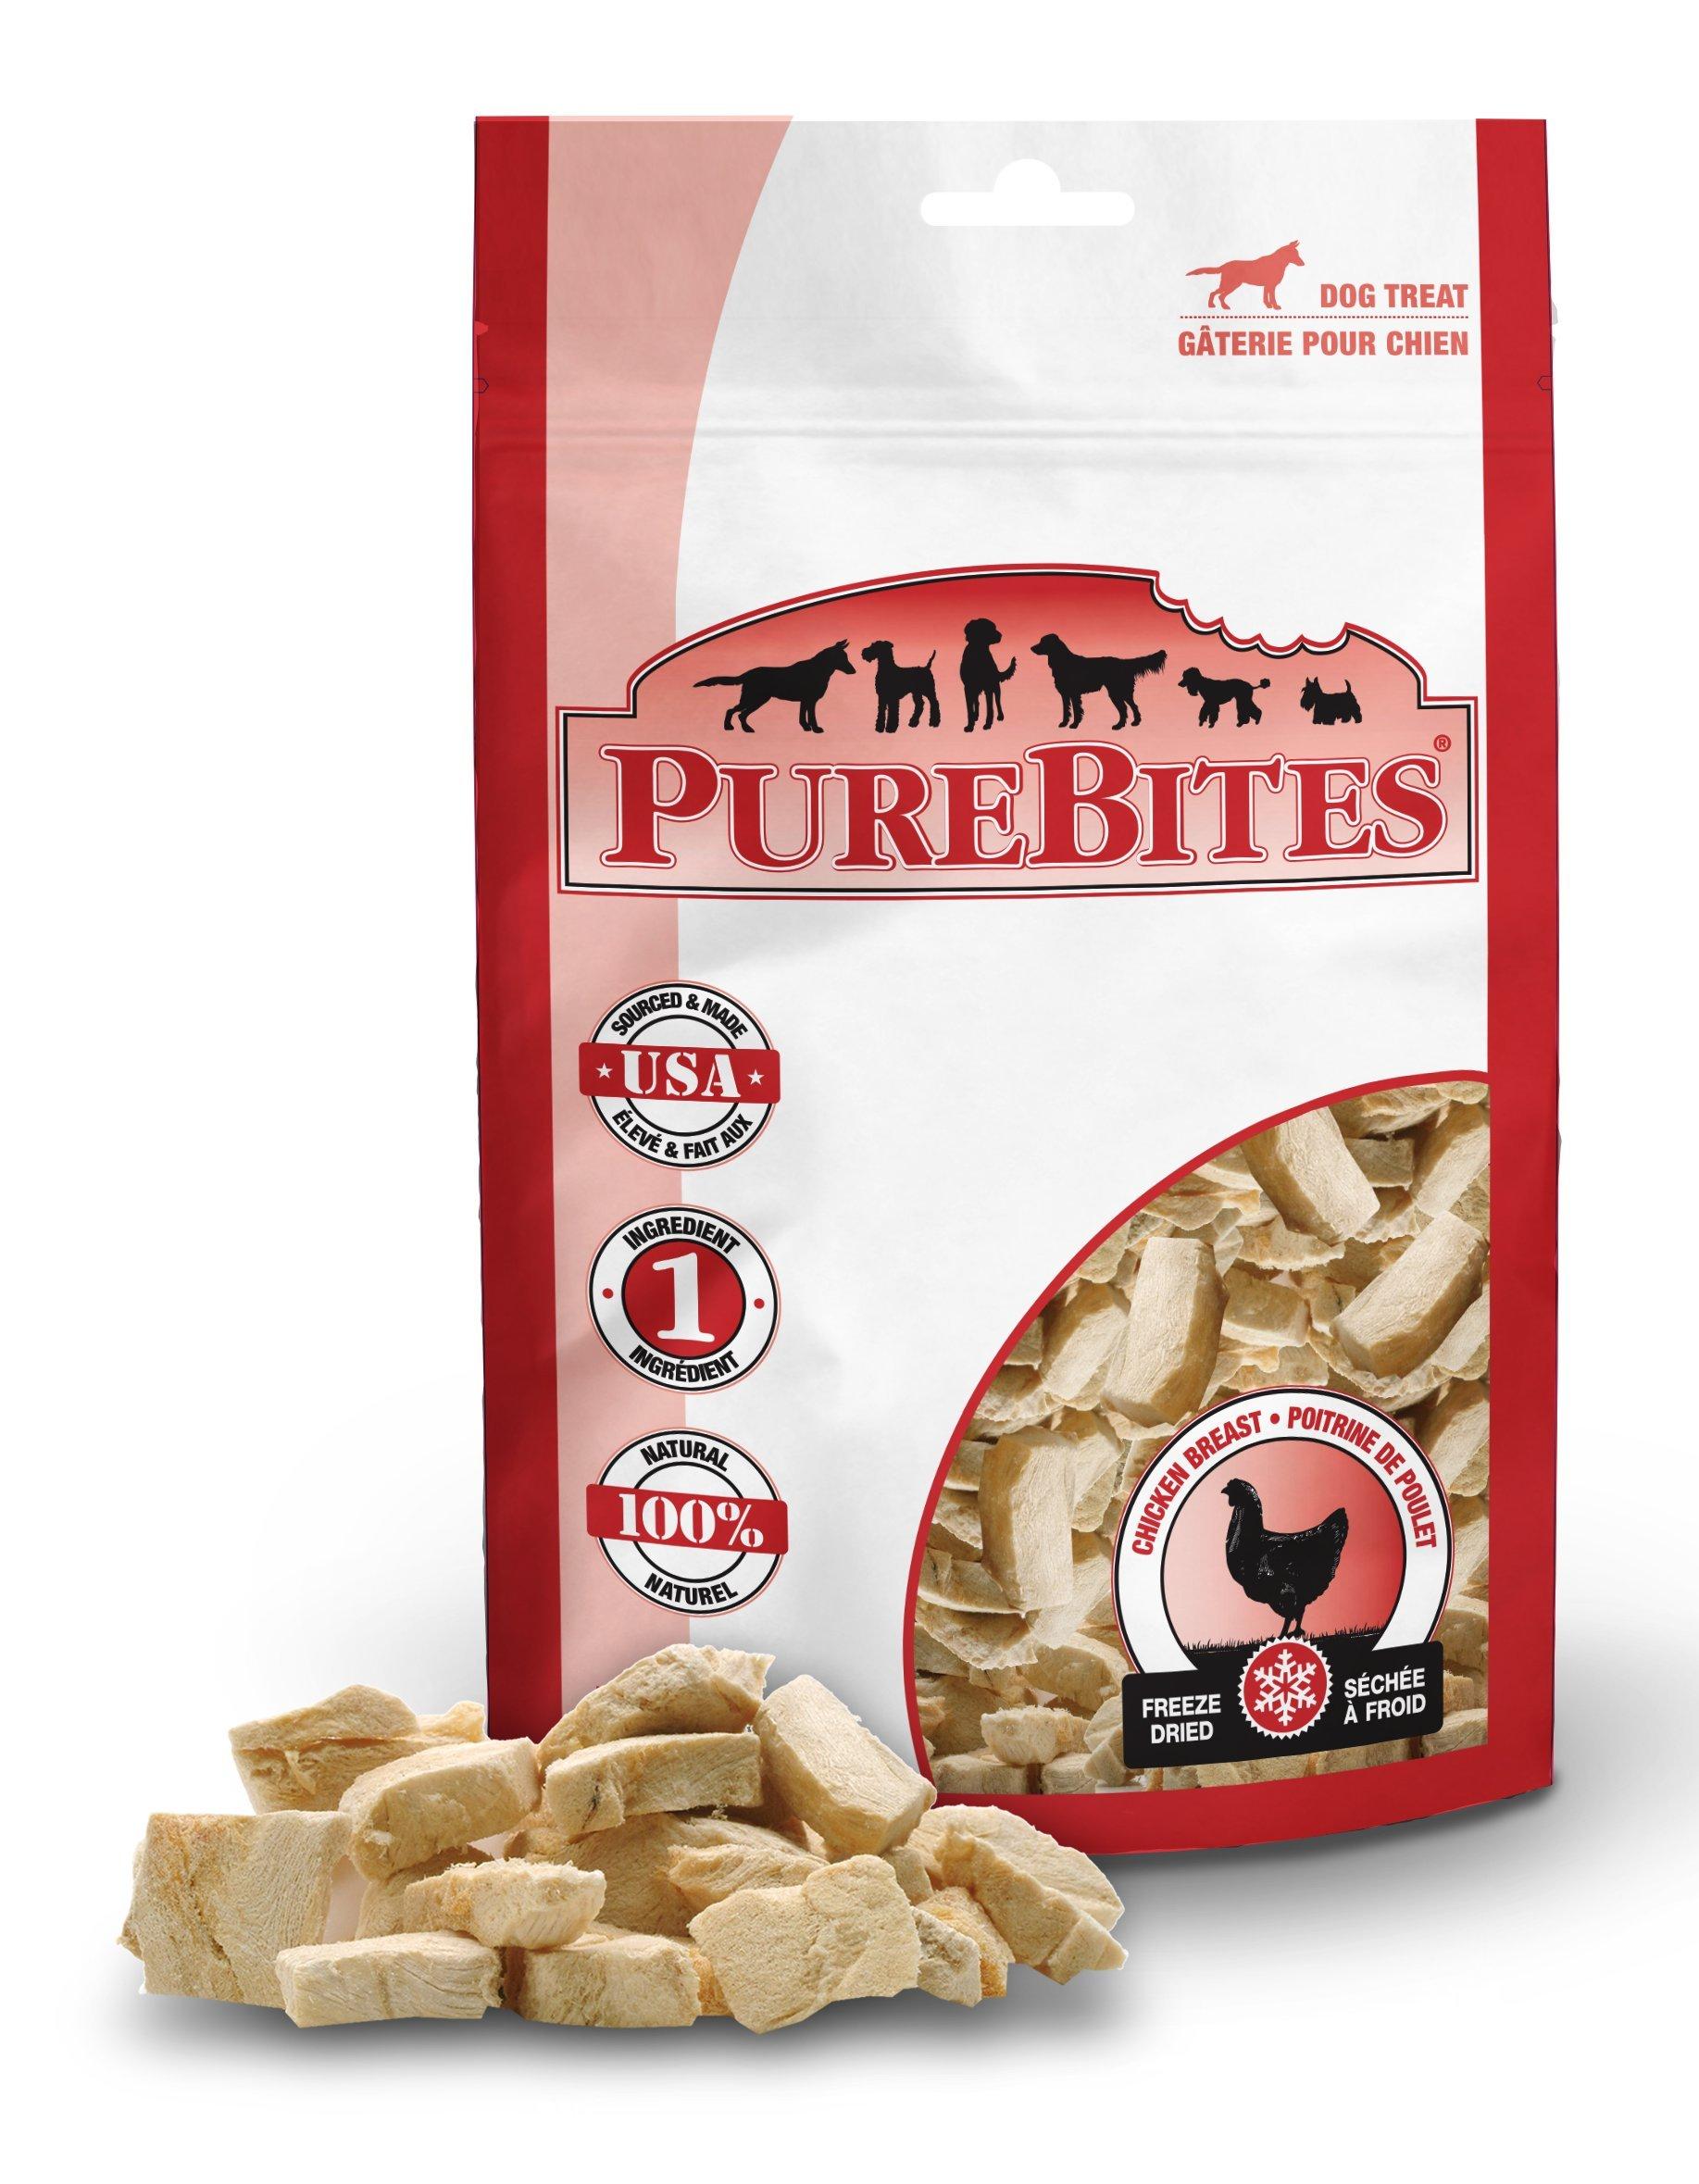 Purebites Chicken Breast For Dogs, 11.6Oz / 330G - Super Value Size by PureBites